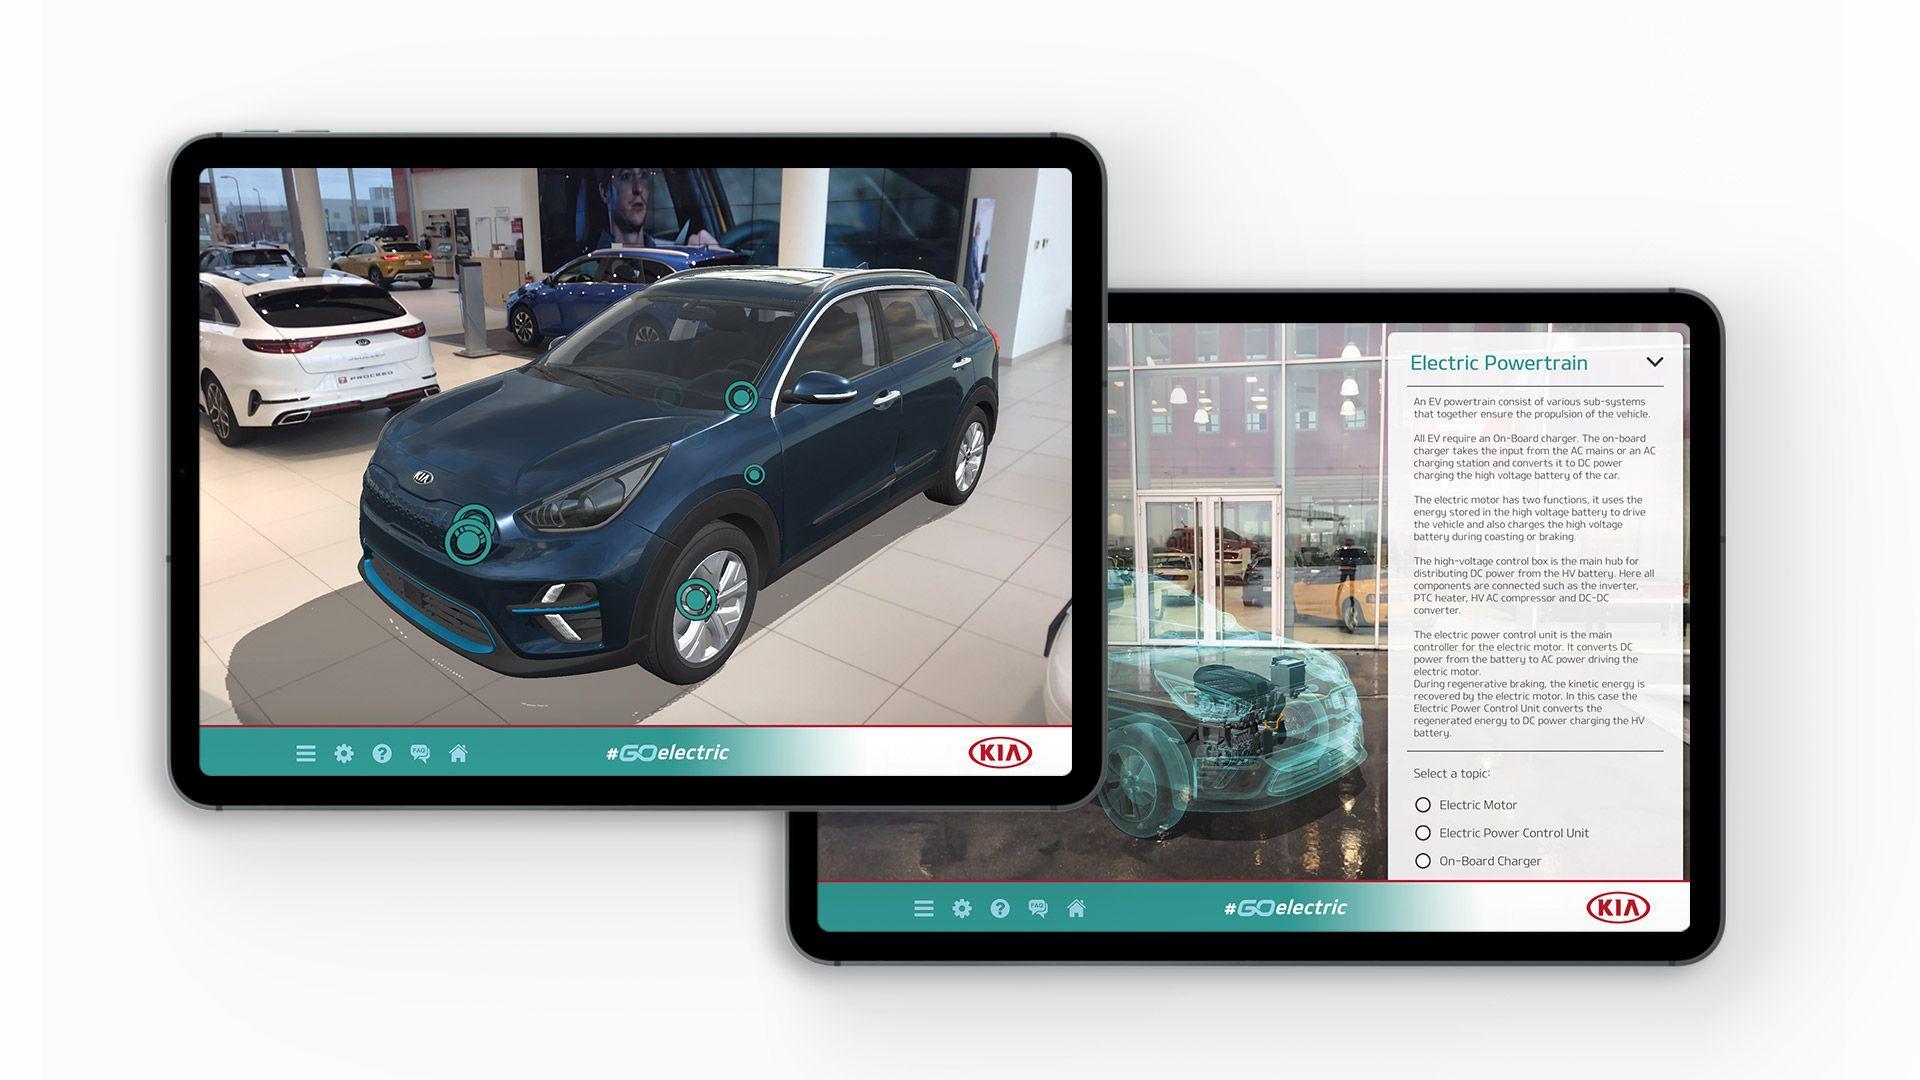 Kia Go Electric App digital app